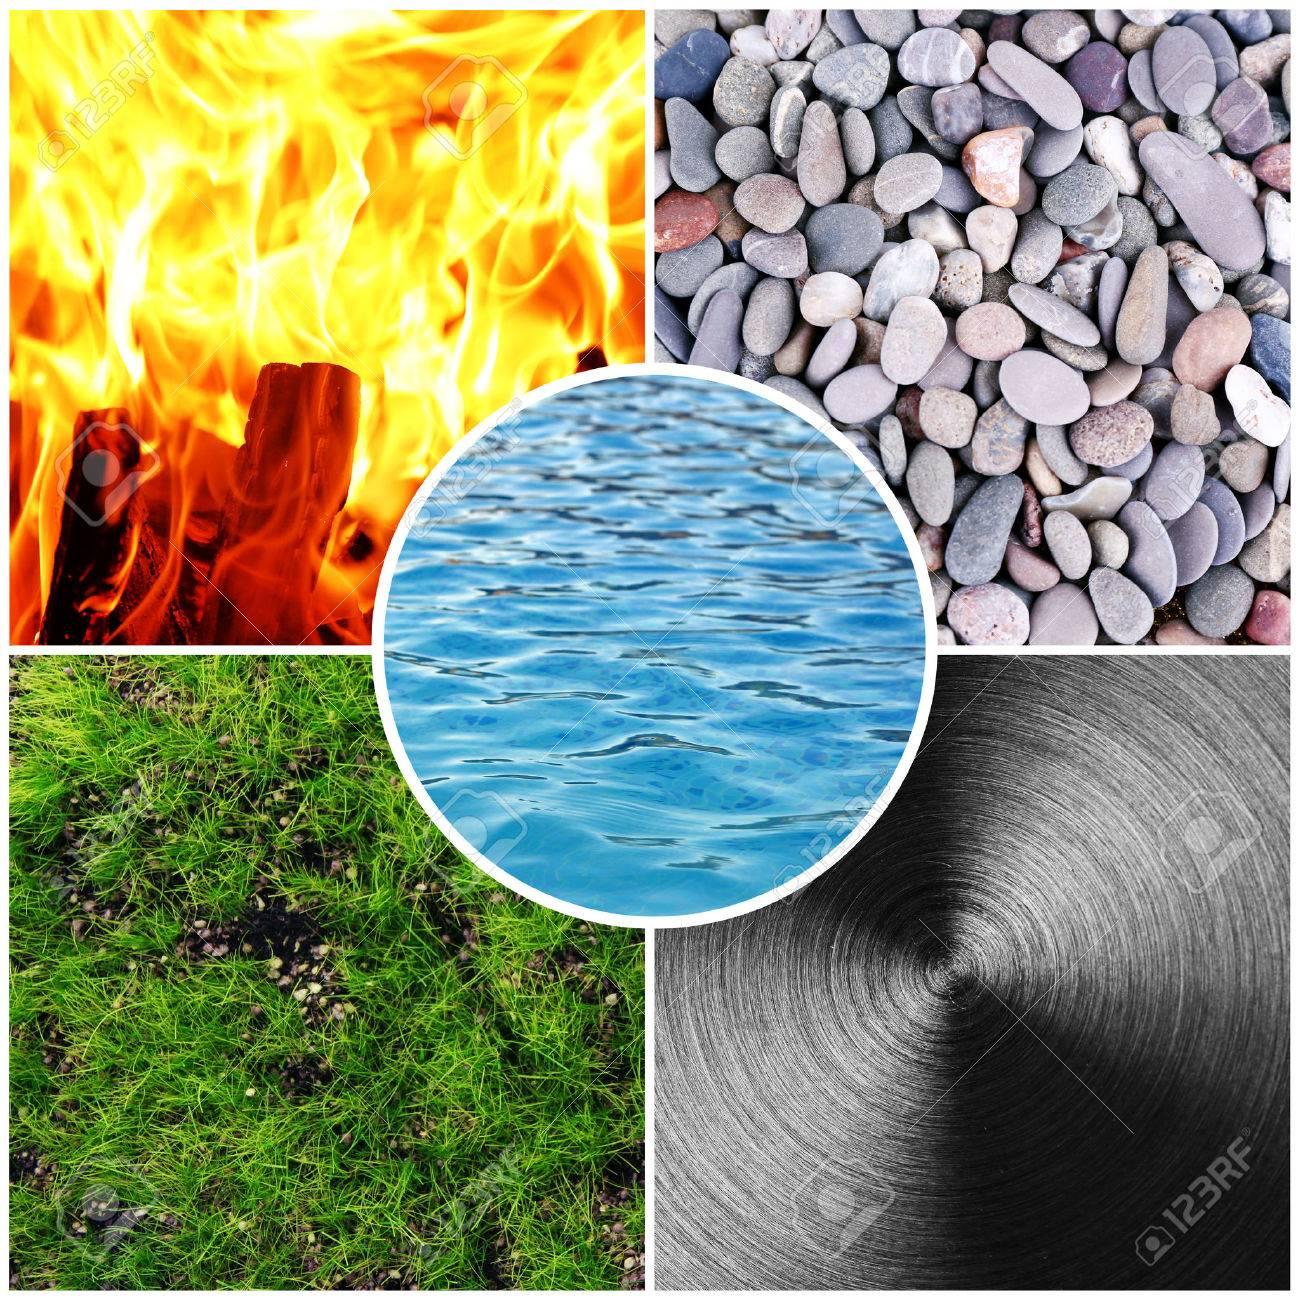 Elemente Feuer Wasser Erde Luft Metall Feng Shui Elemente 2019 02 27